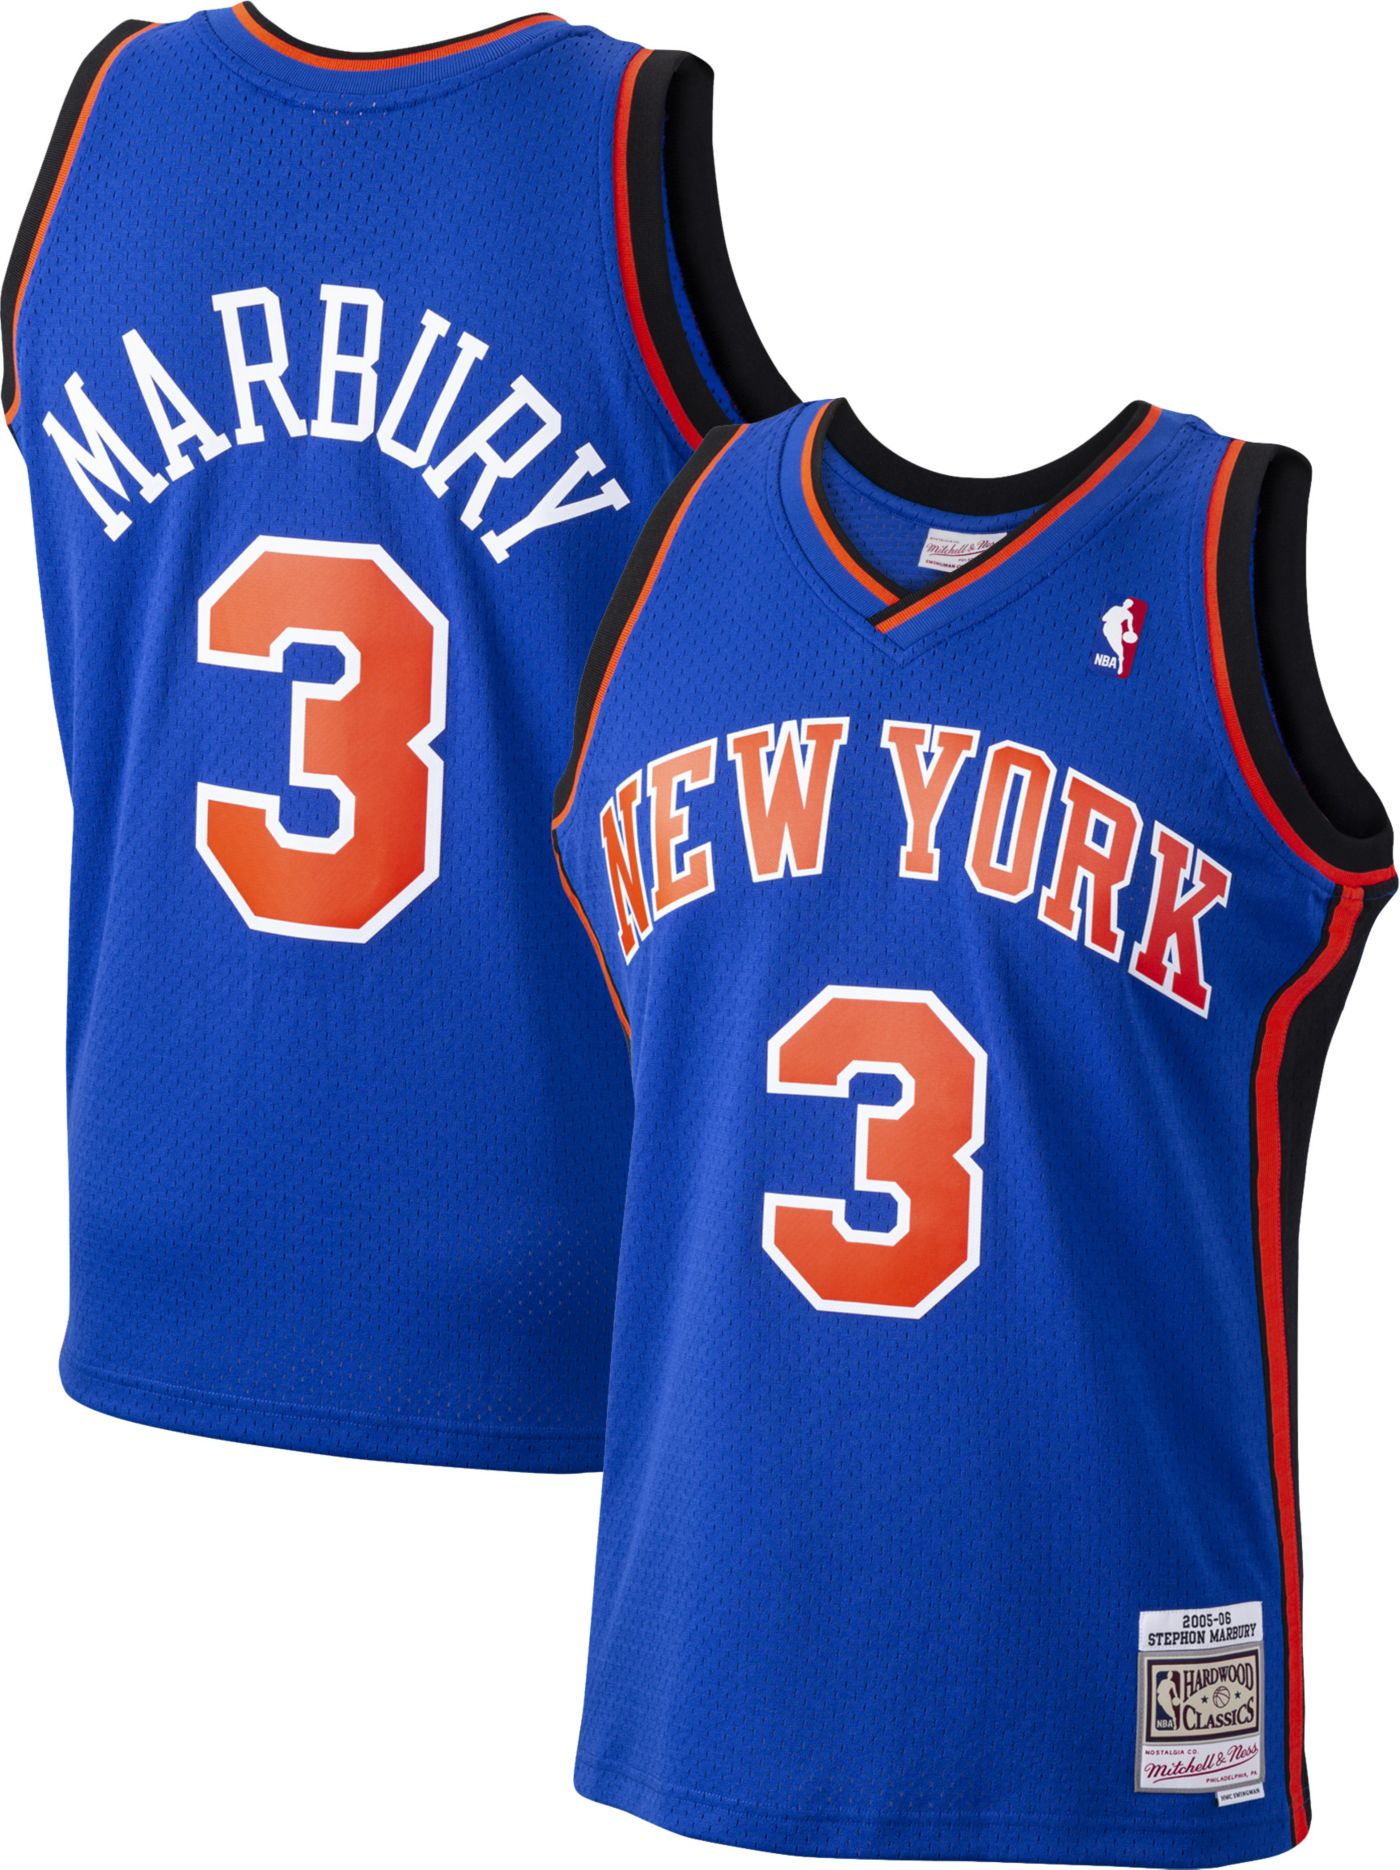 Mitchell & Ness Men's New York Knicks Stephon Marbury #3 Swingman Jersey